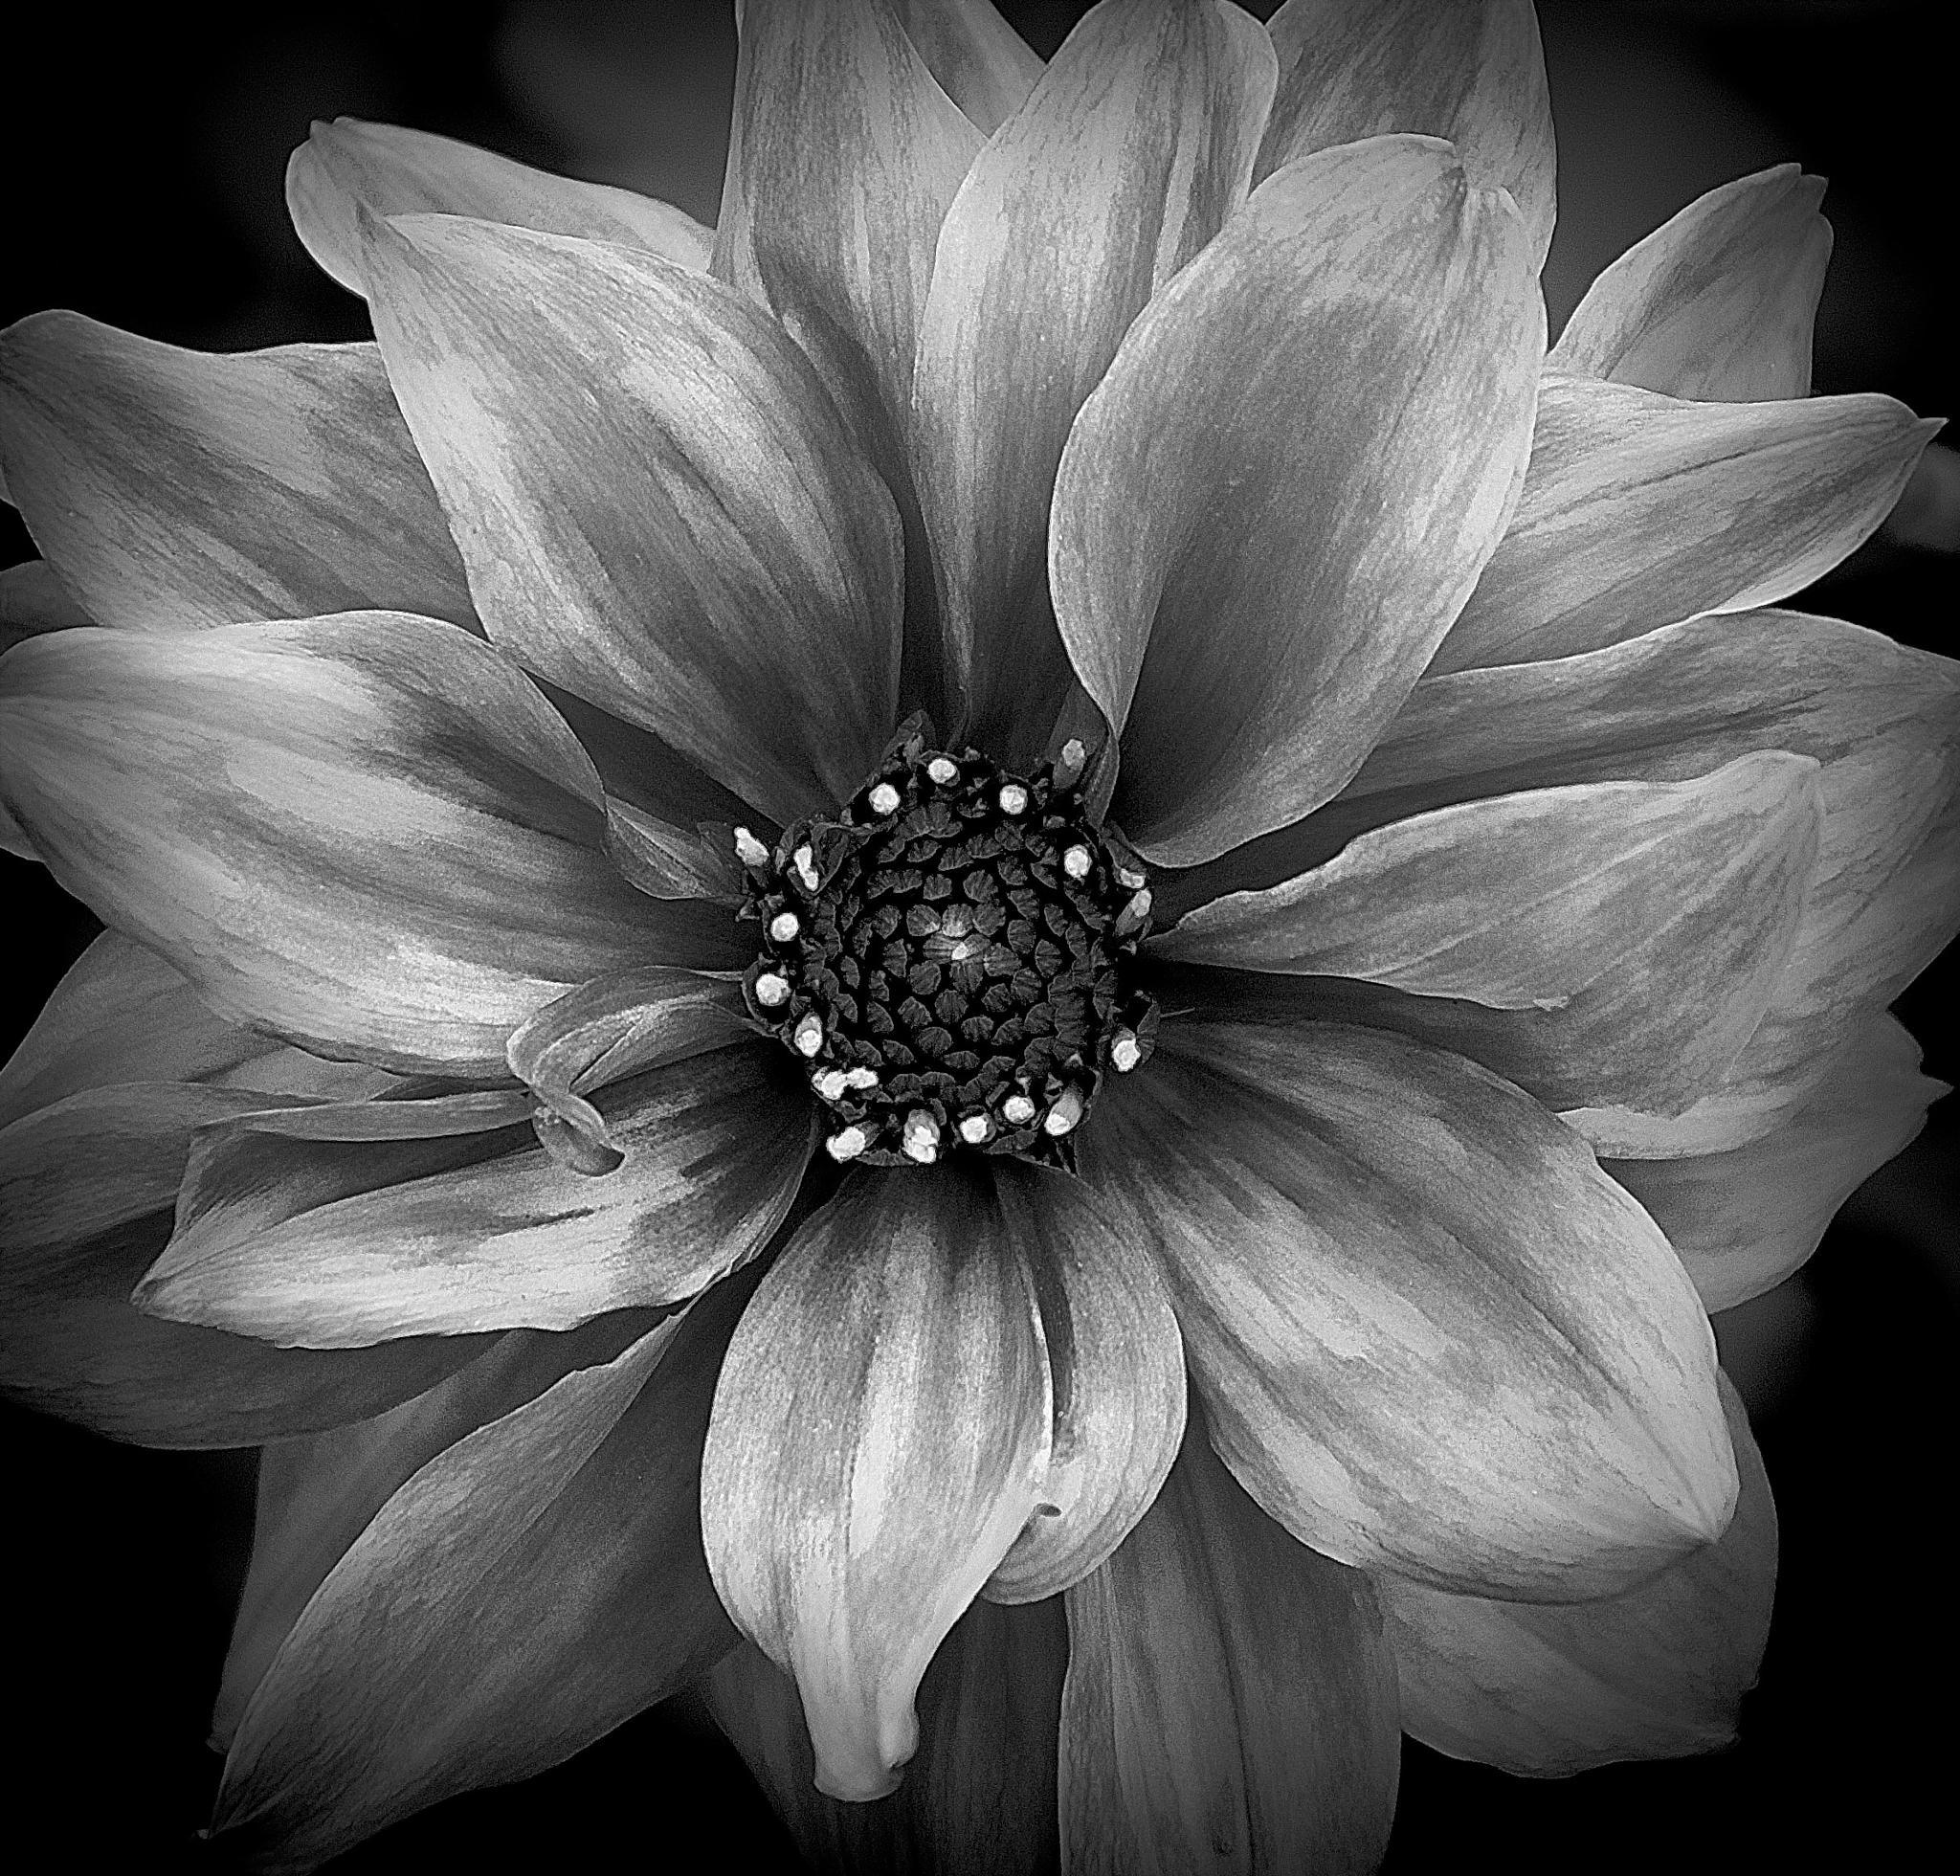 Power Flower No2 by Selman Adzomerovic